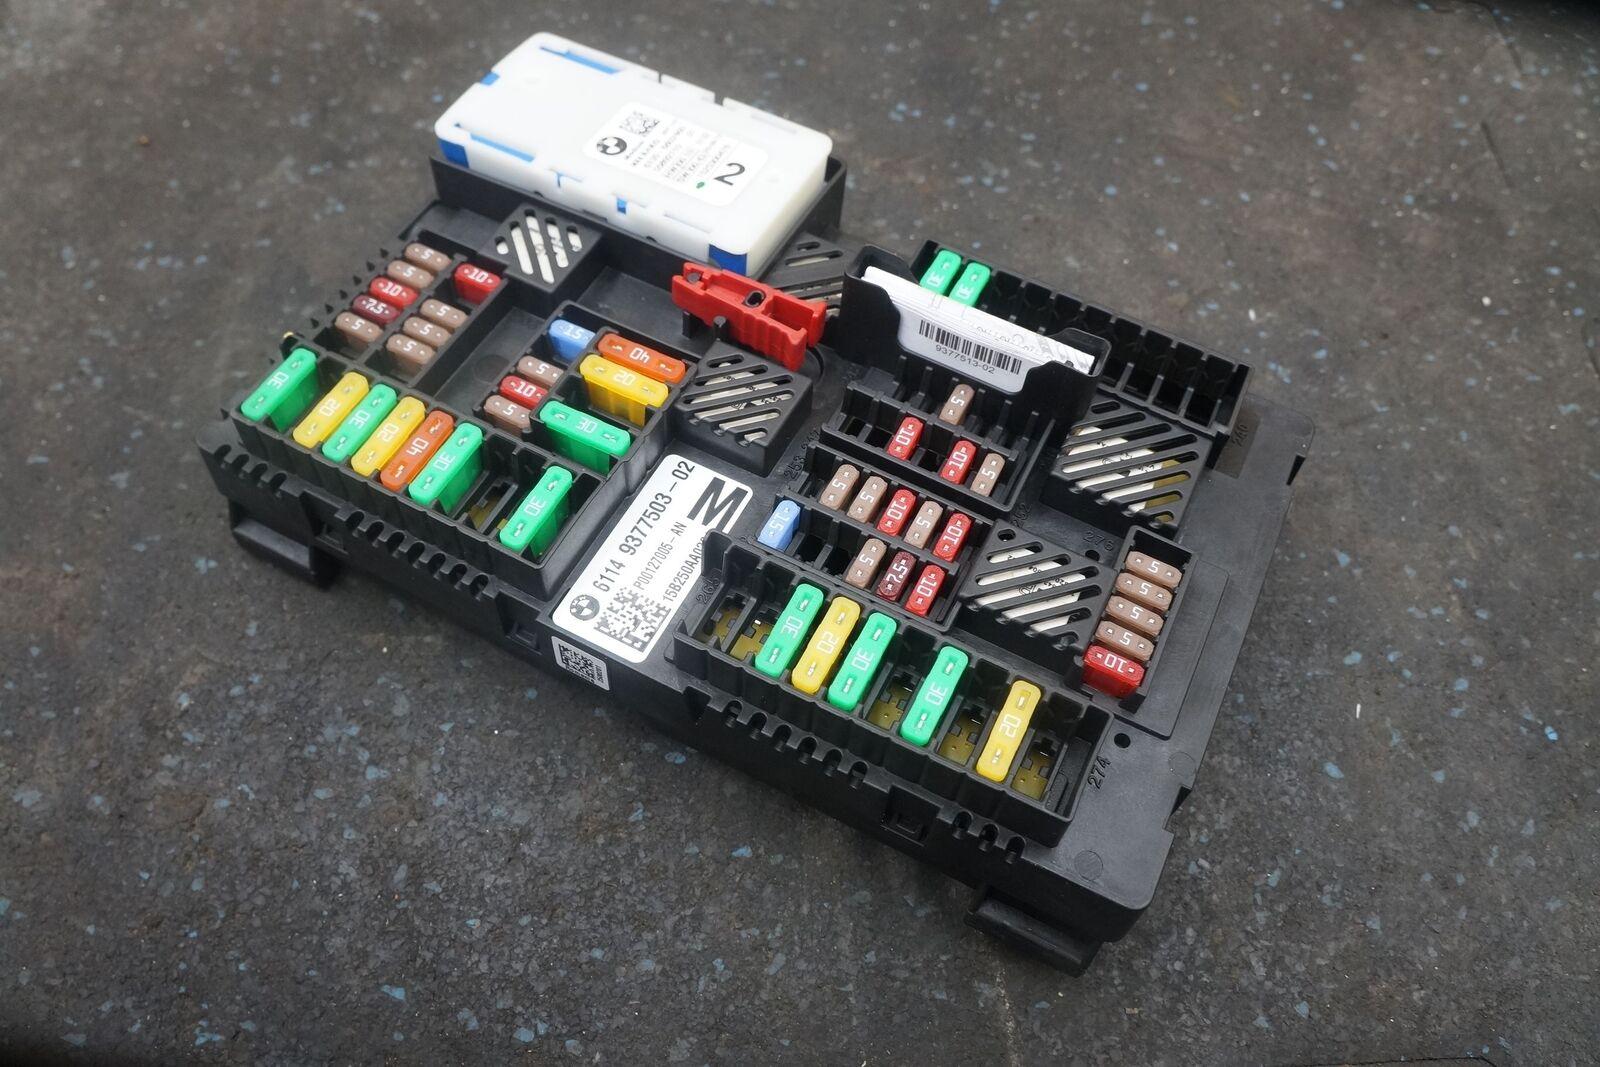 Bmw Power Distribution Fuse Box Schematic Diagram Electronic 1998 Fiat Bravo 14 Rear Block 61149377503 750i 740i G11 Rhpacificmotors